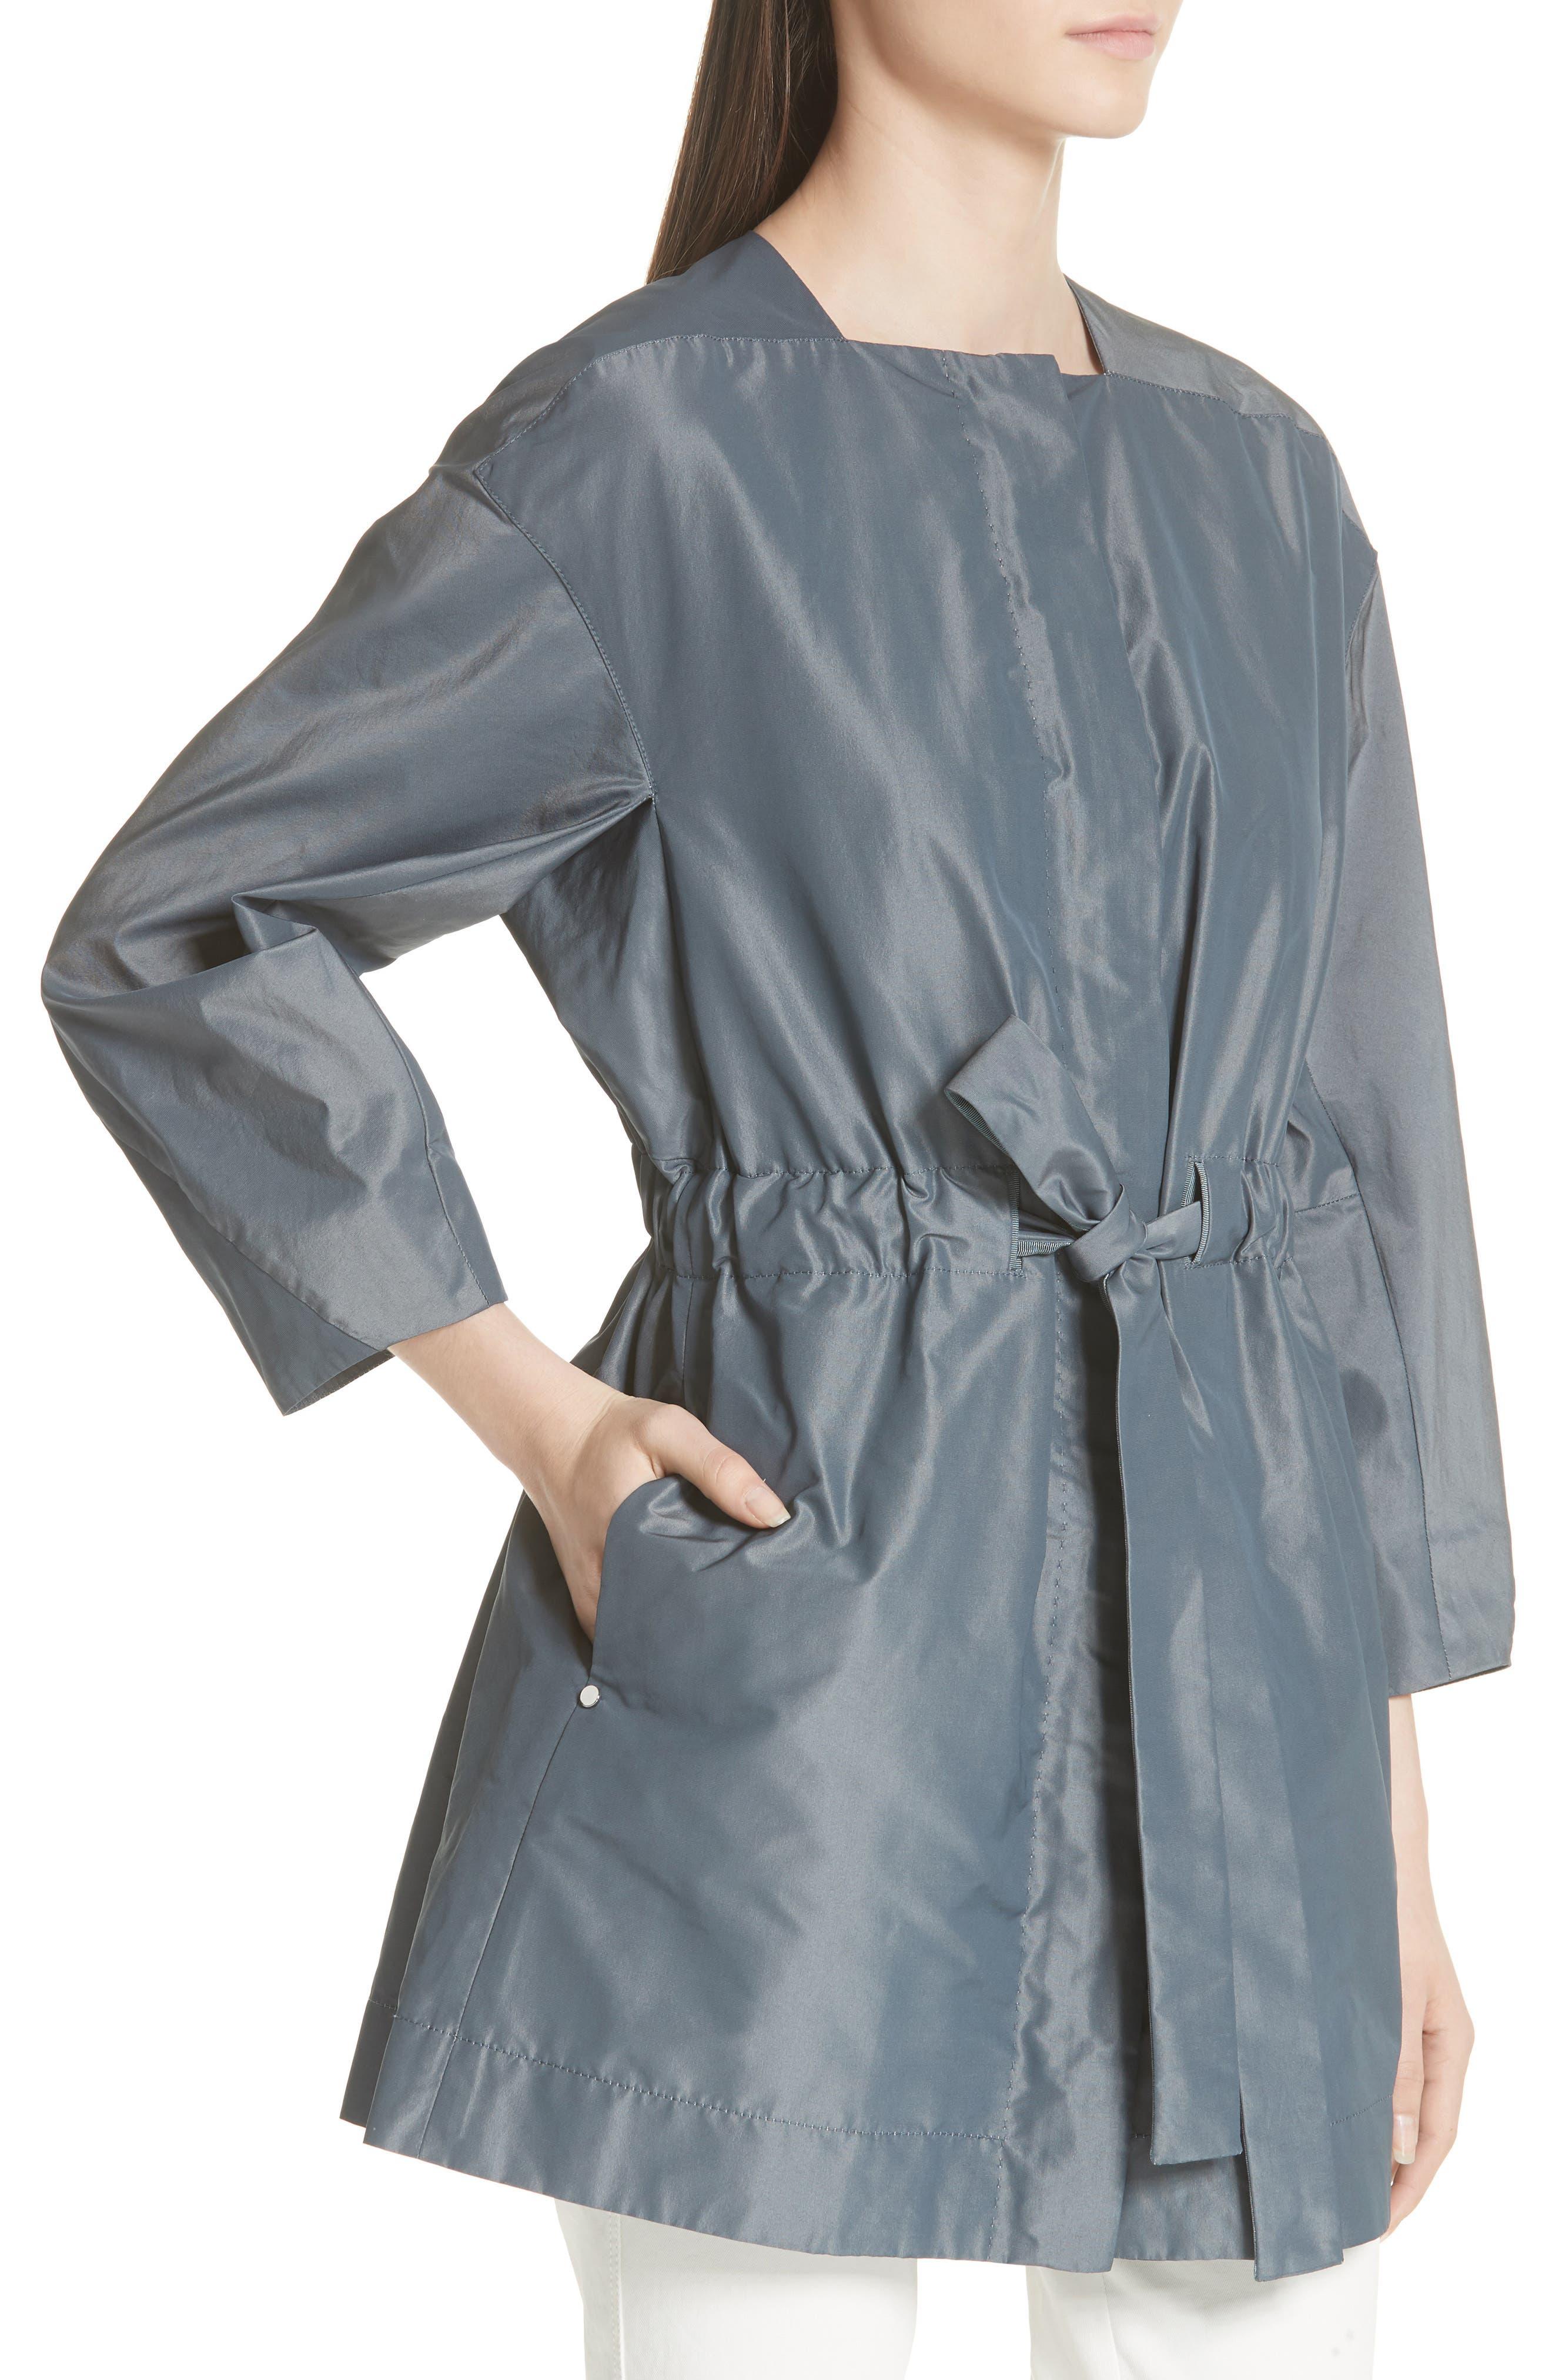 Stephania Jacket,                             Alternate thumbnail 4, color,                             PORT BLUE IRIDESCENT